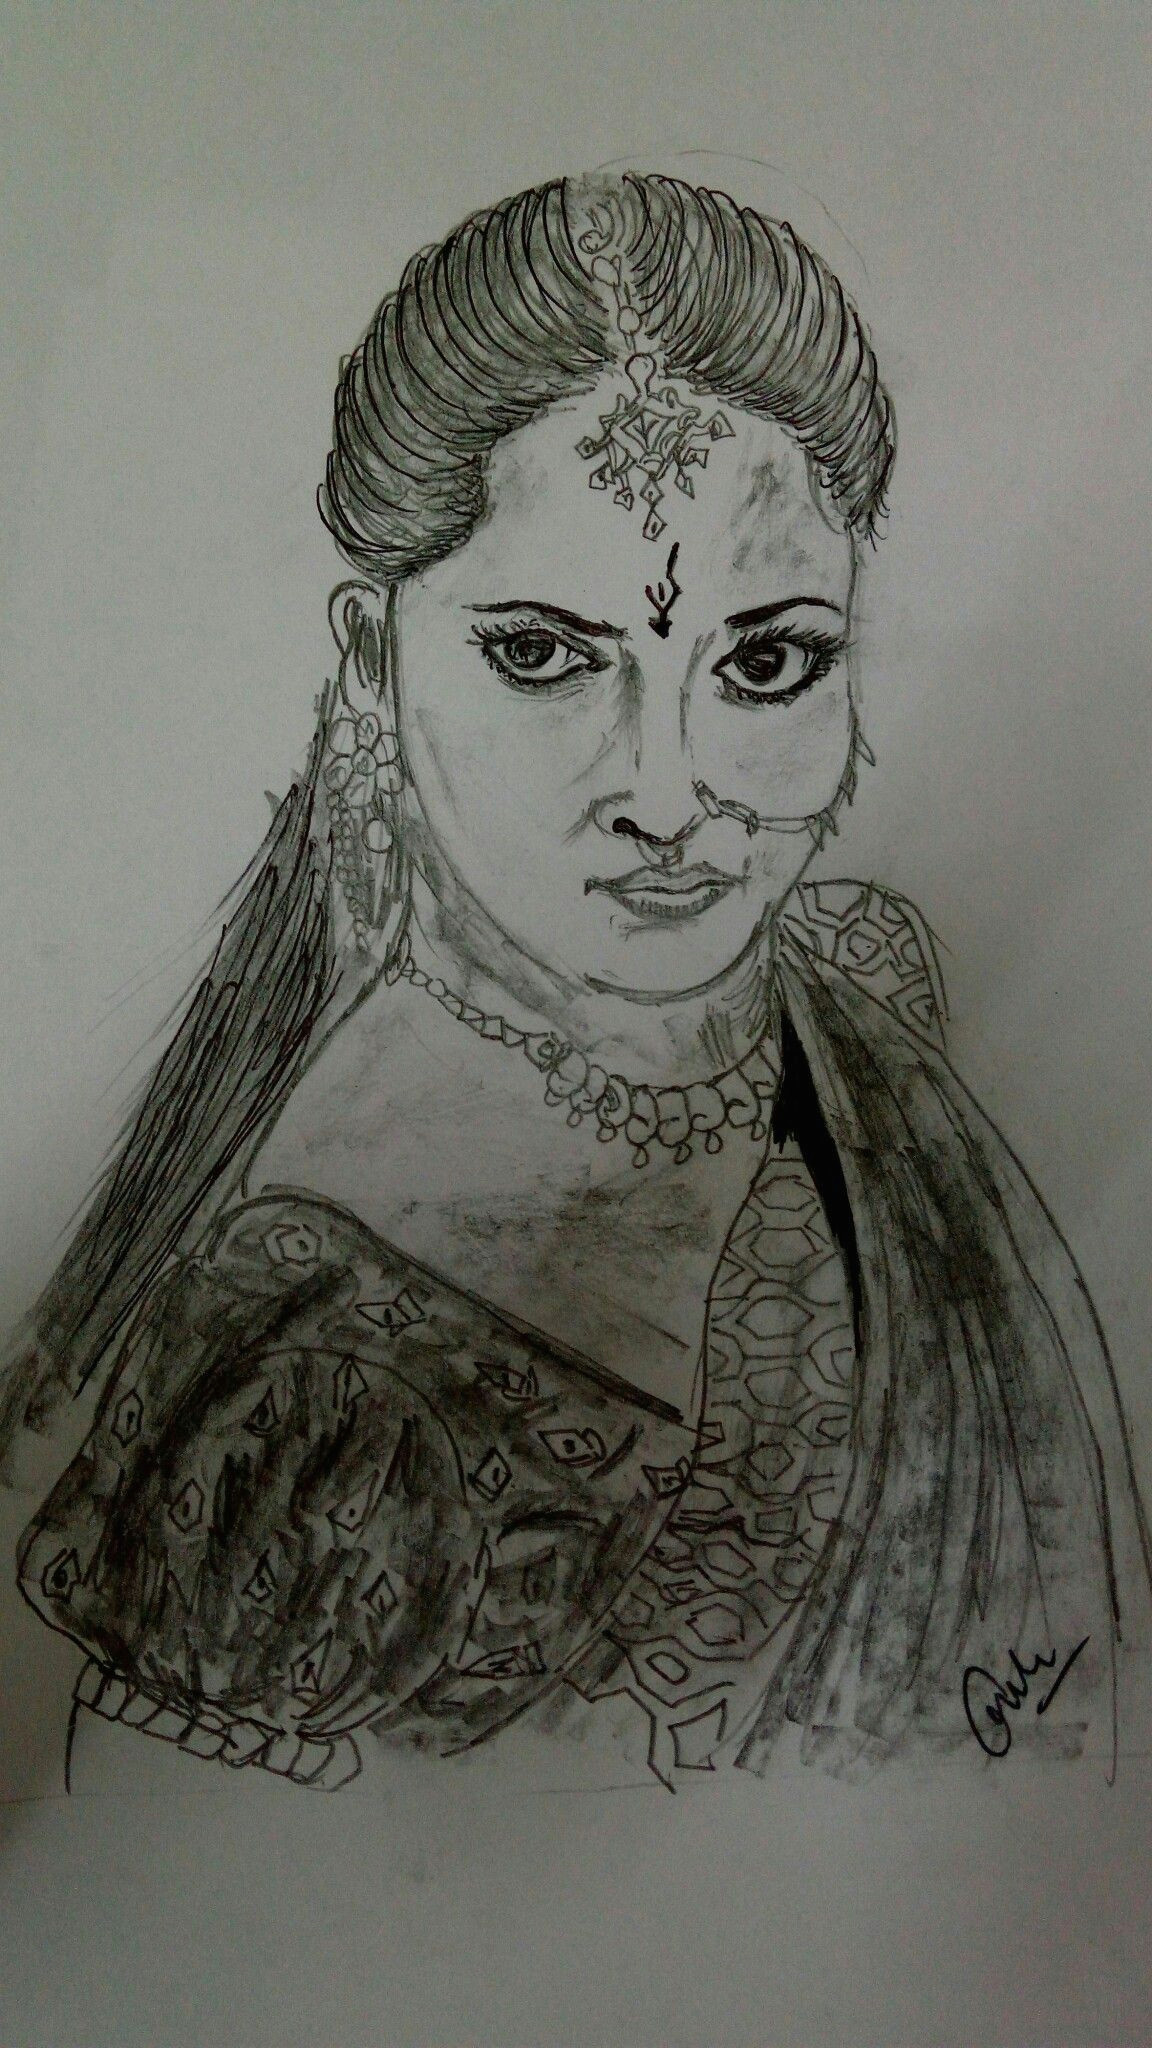 Bahubali 2 Drawing Easy Bahubali 2 Sketch Of Anushka Shetty Sketching Of Devsena